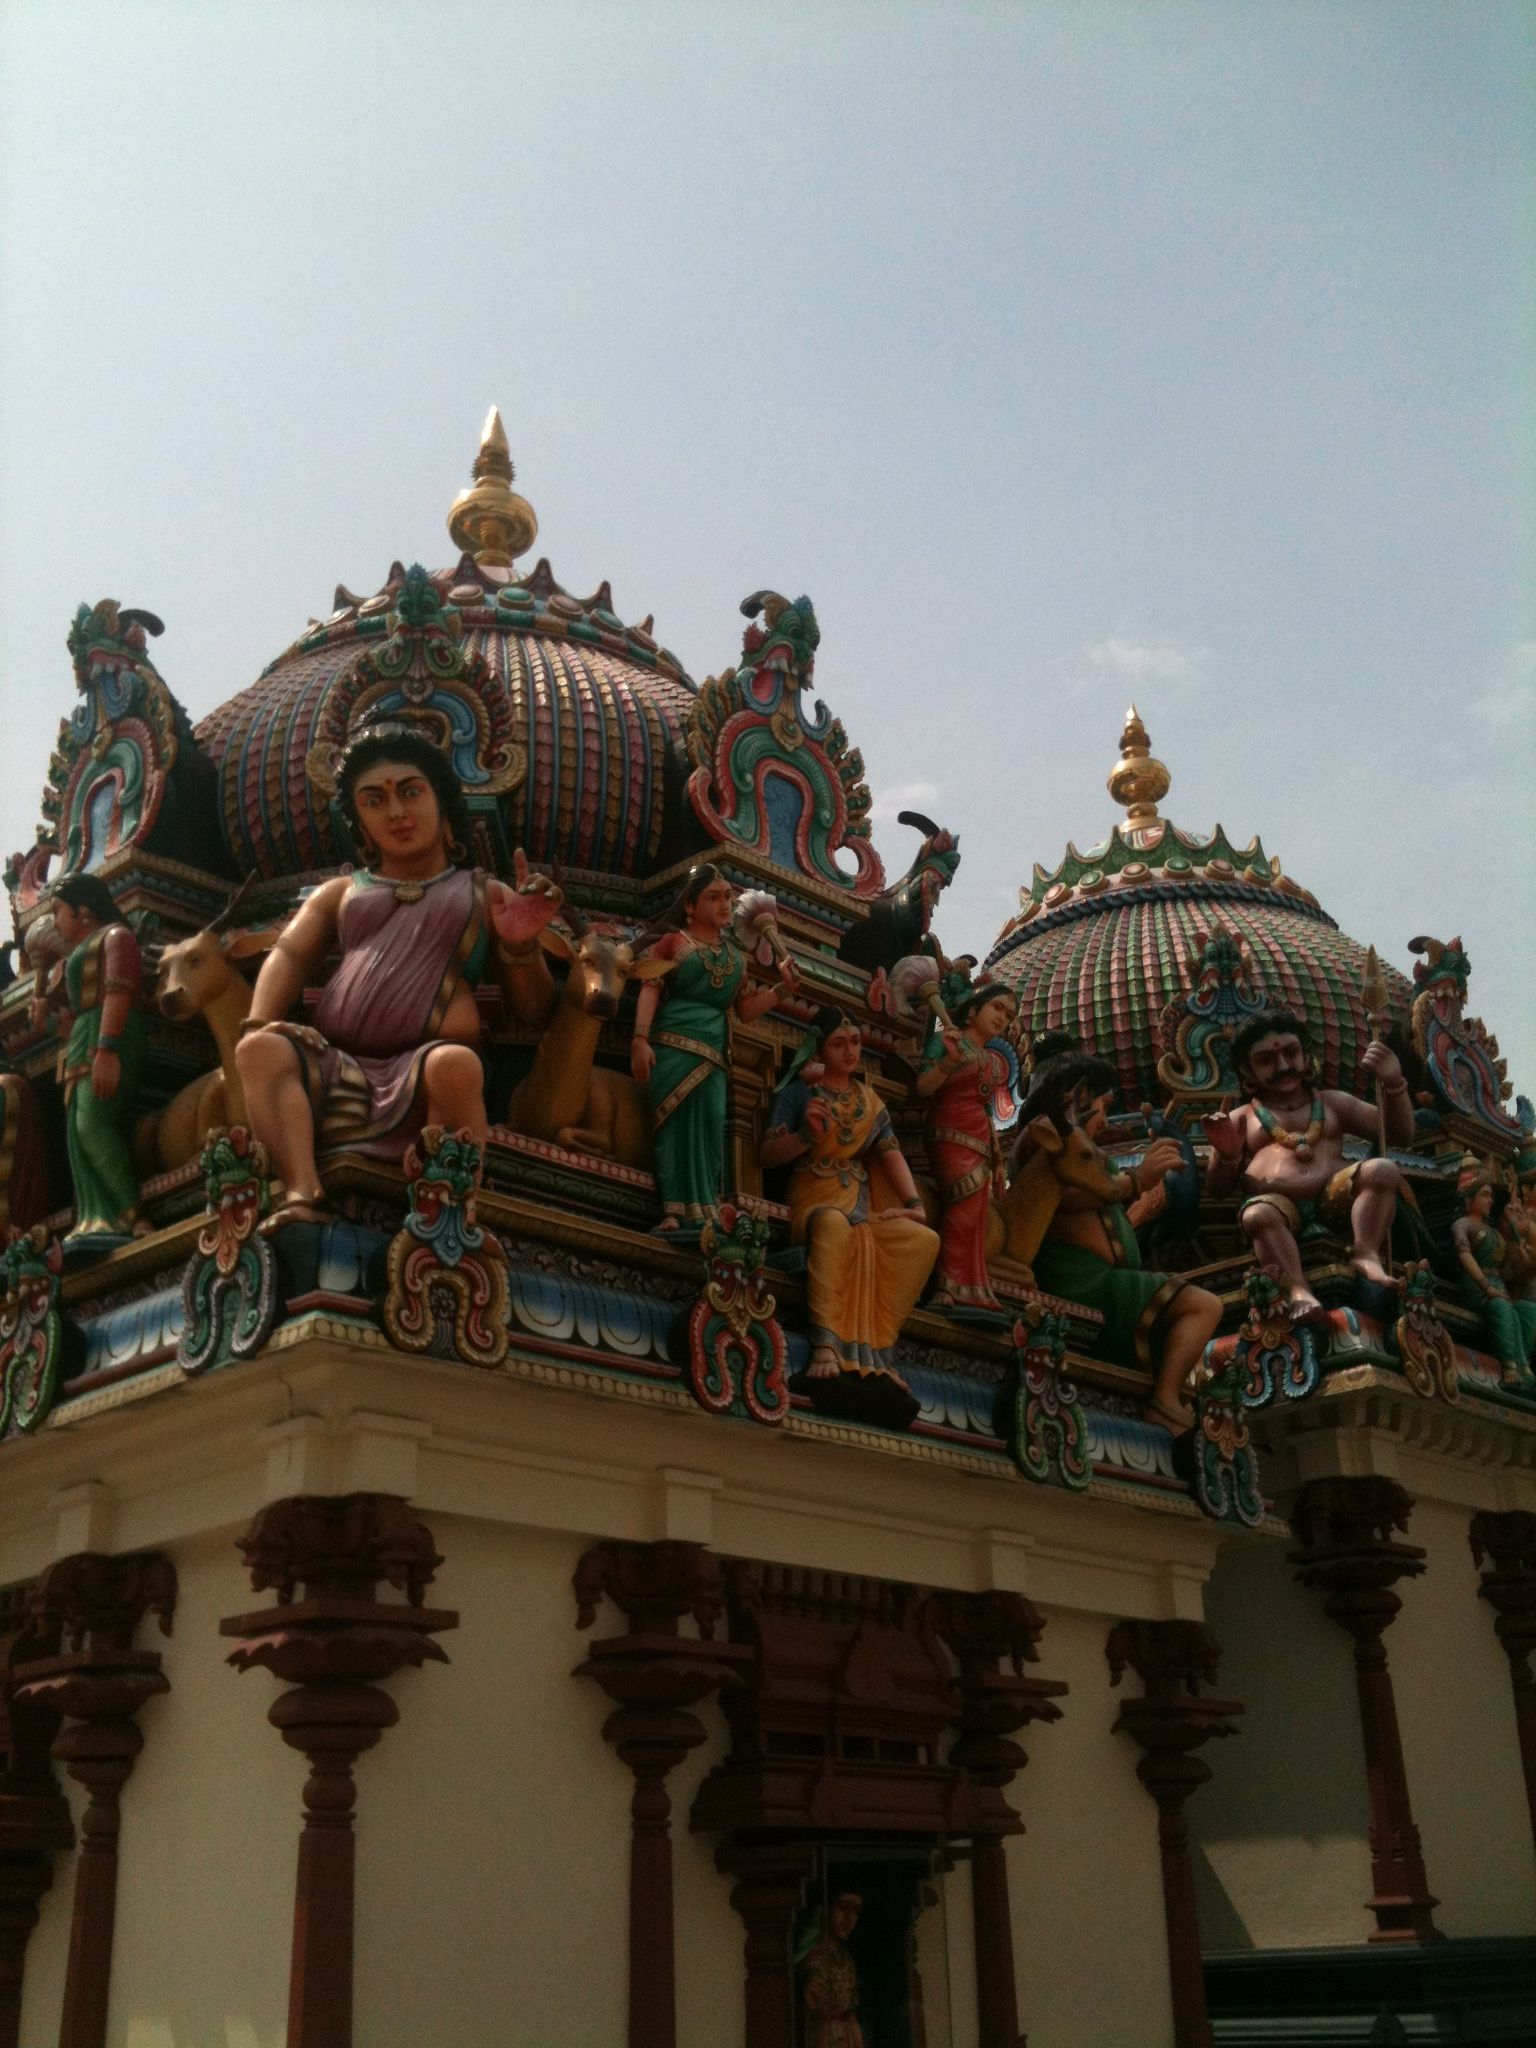 Hindu temple, Singapore Hindu temple, Temple, Big ben